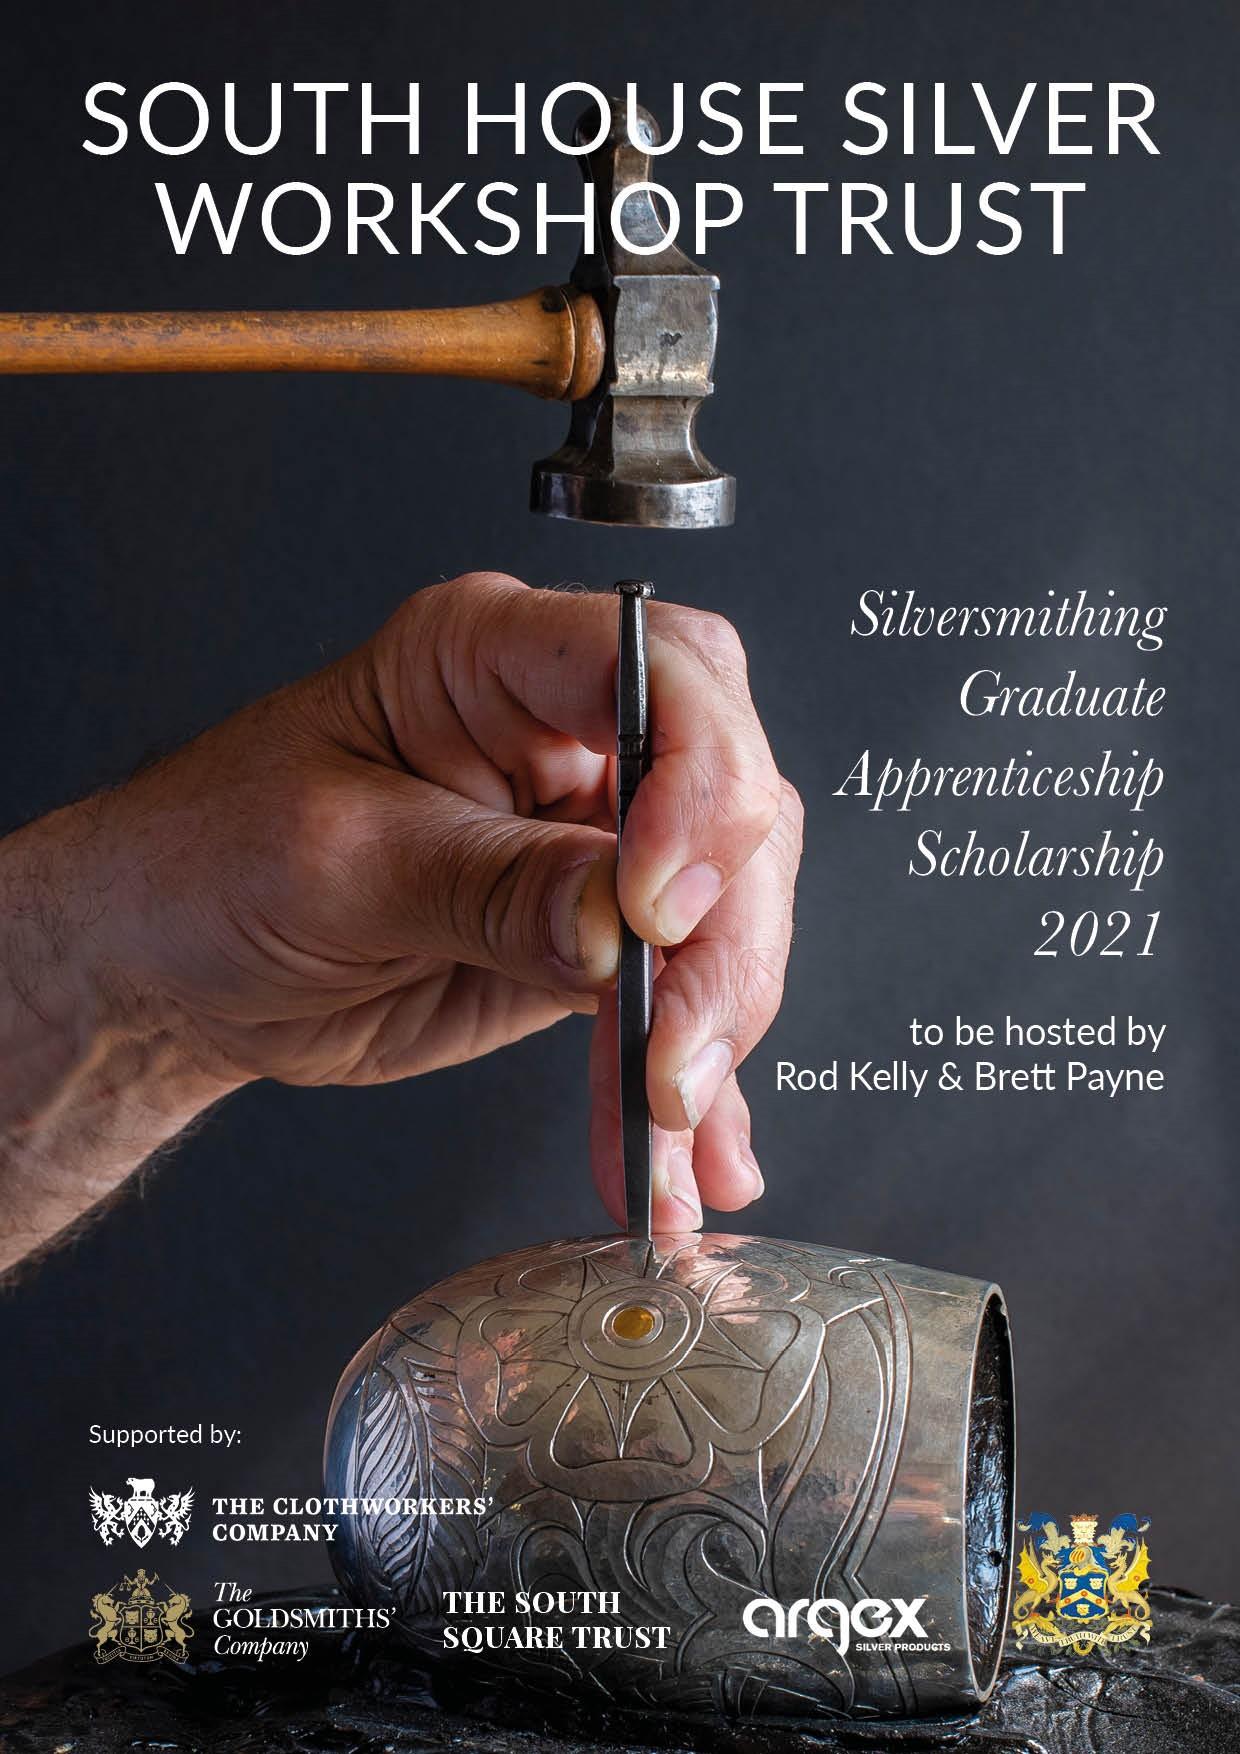 South House Silver Workshop Trust: Silversmithing Graduate Apprenticeship Scholarship 2021